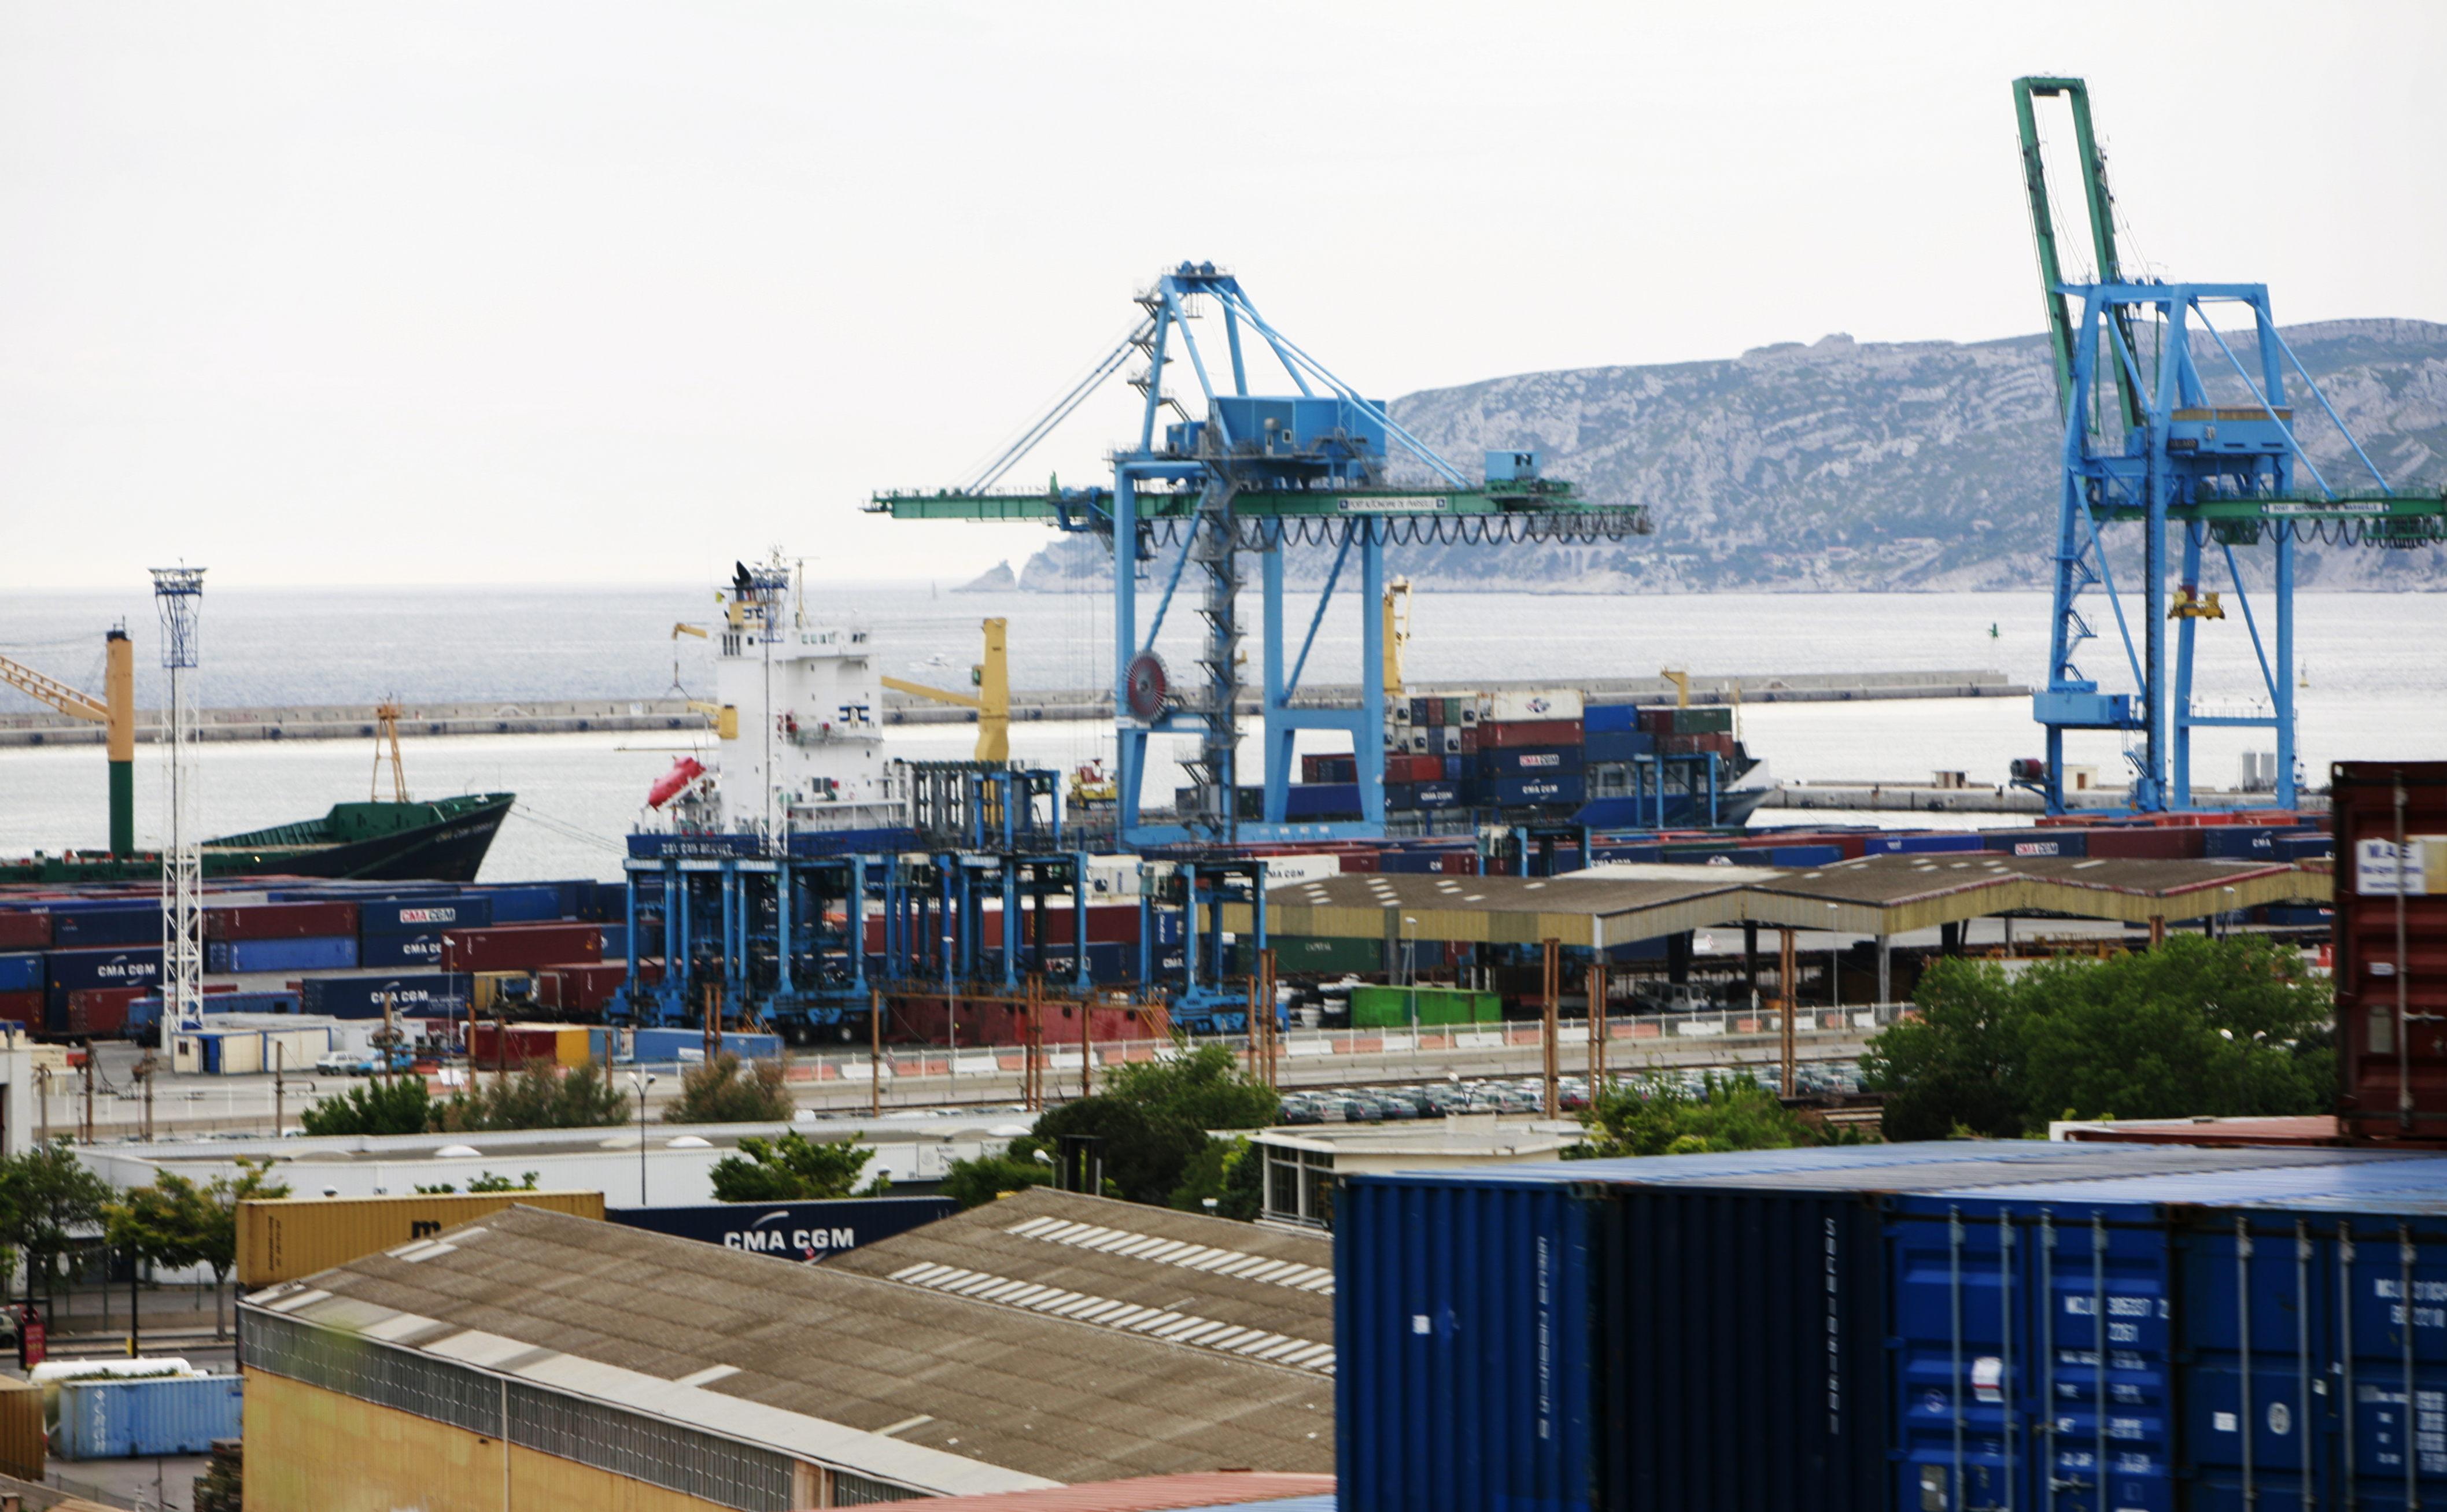 grand port maritime de marseille wikiwand